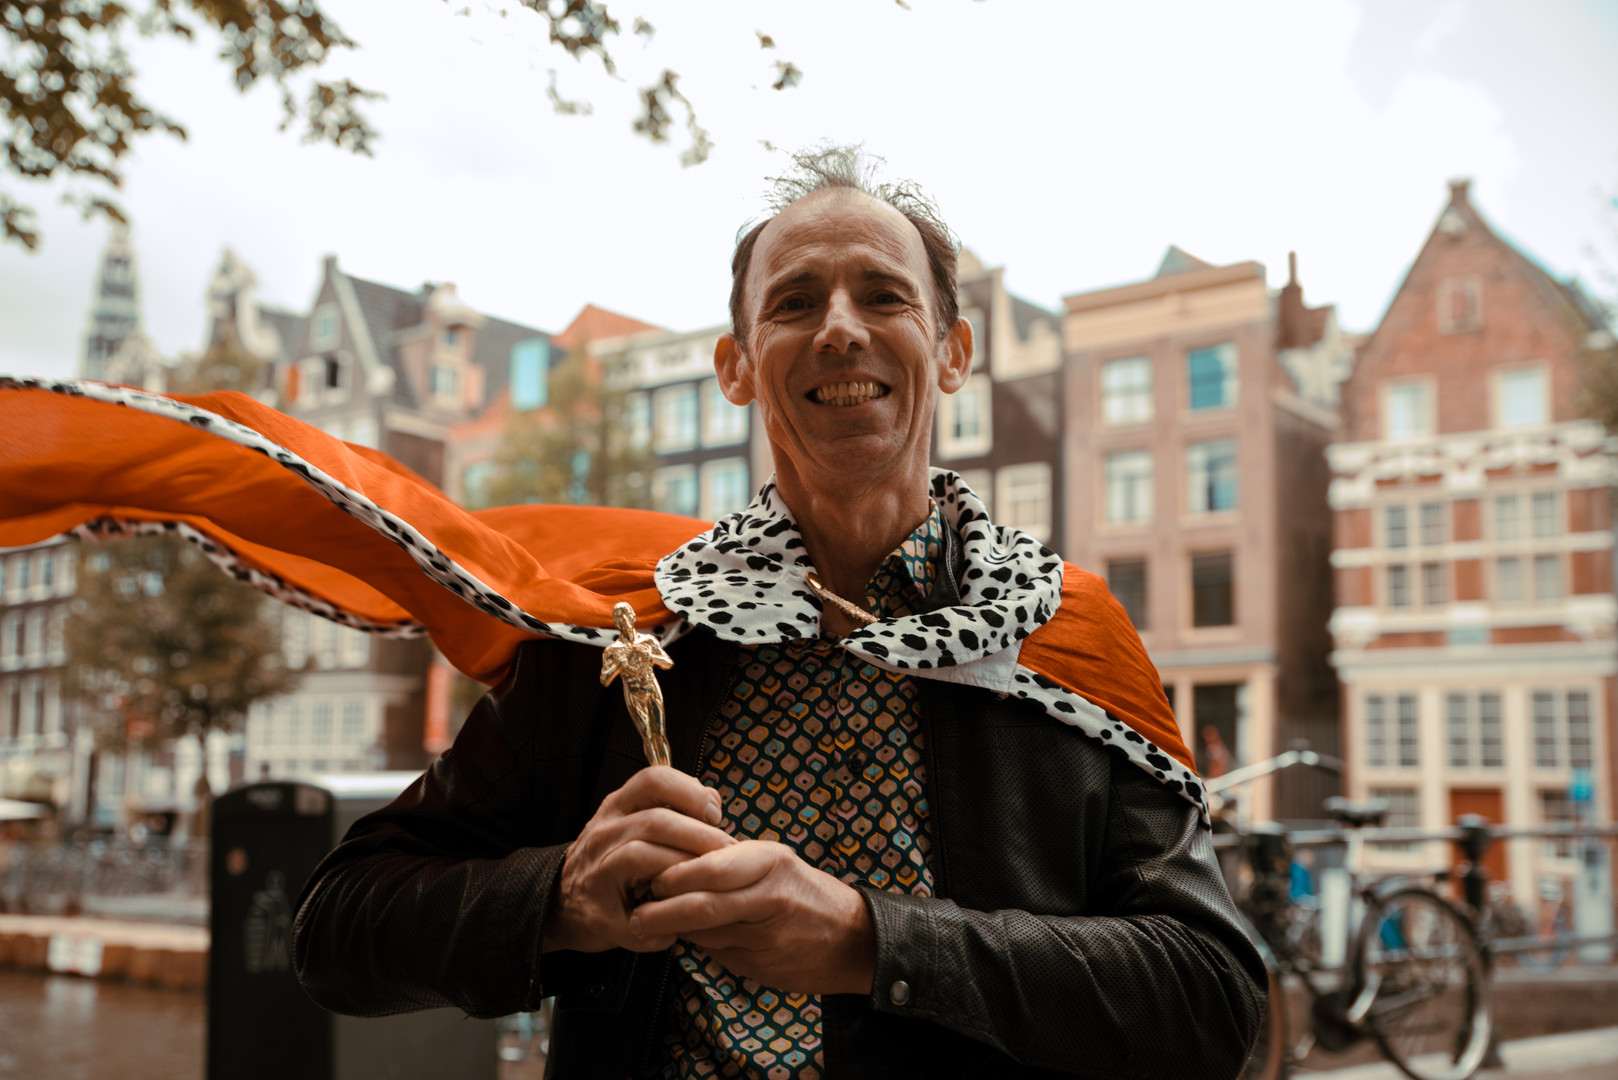 21-09-2018_keepitcleanday_amsterdam-21.j